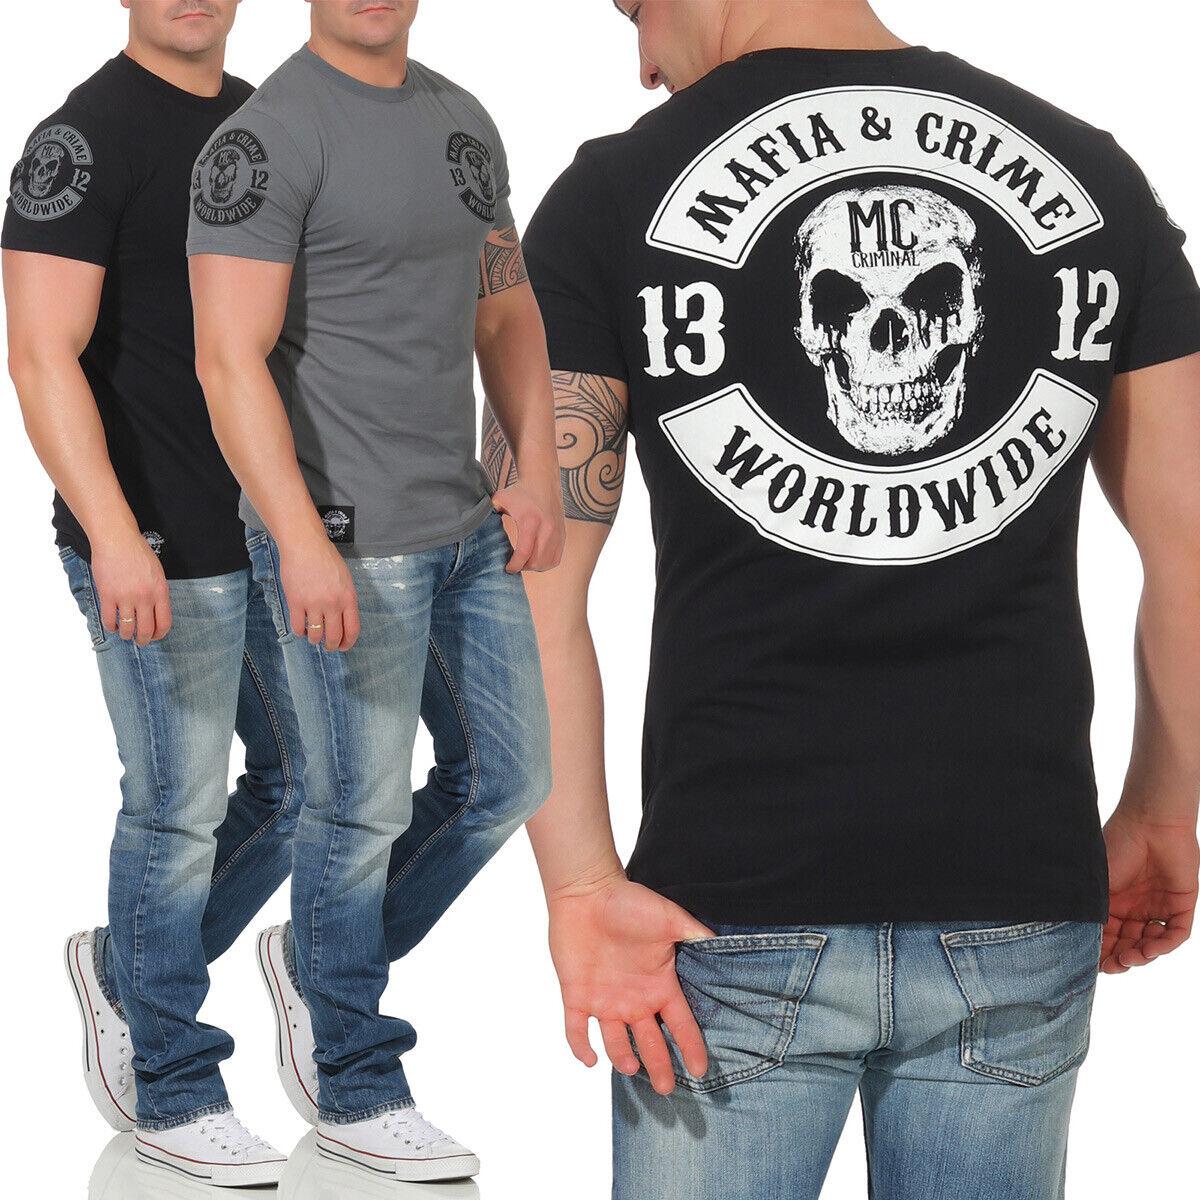 Cleaver Inspired The Sopranos Mafia Crime Mens Gangster USA Movie Film T Shirt